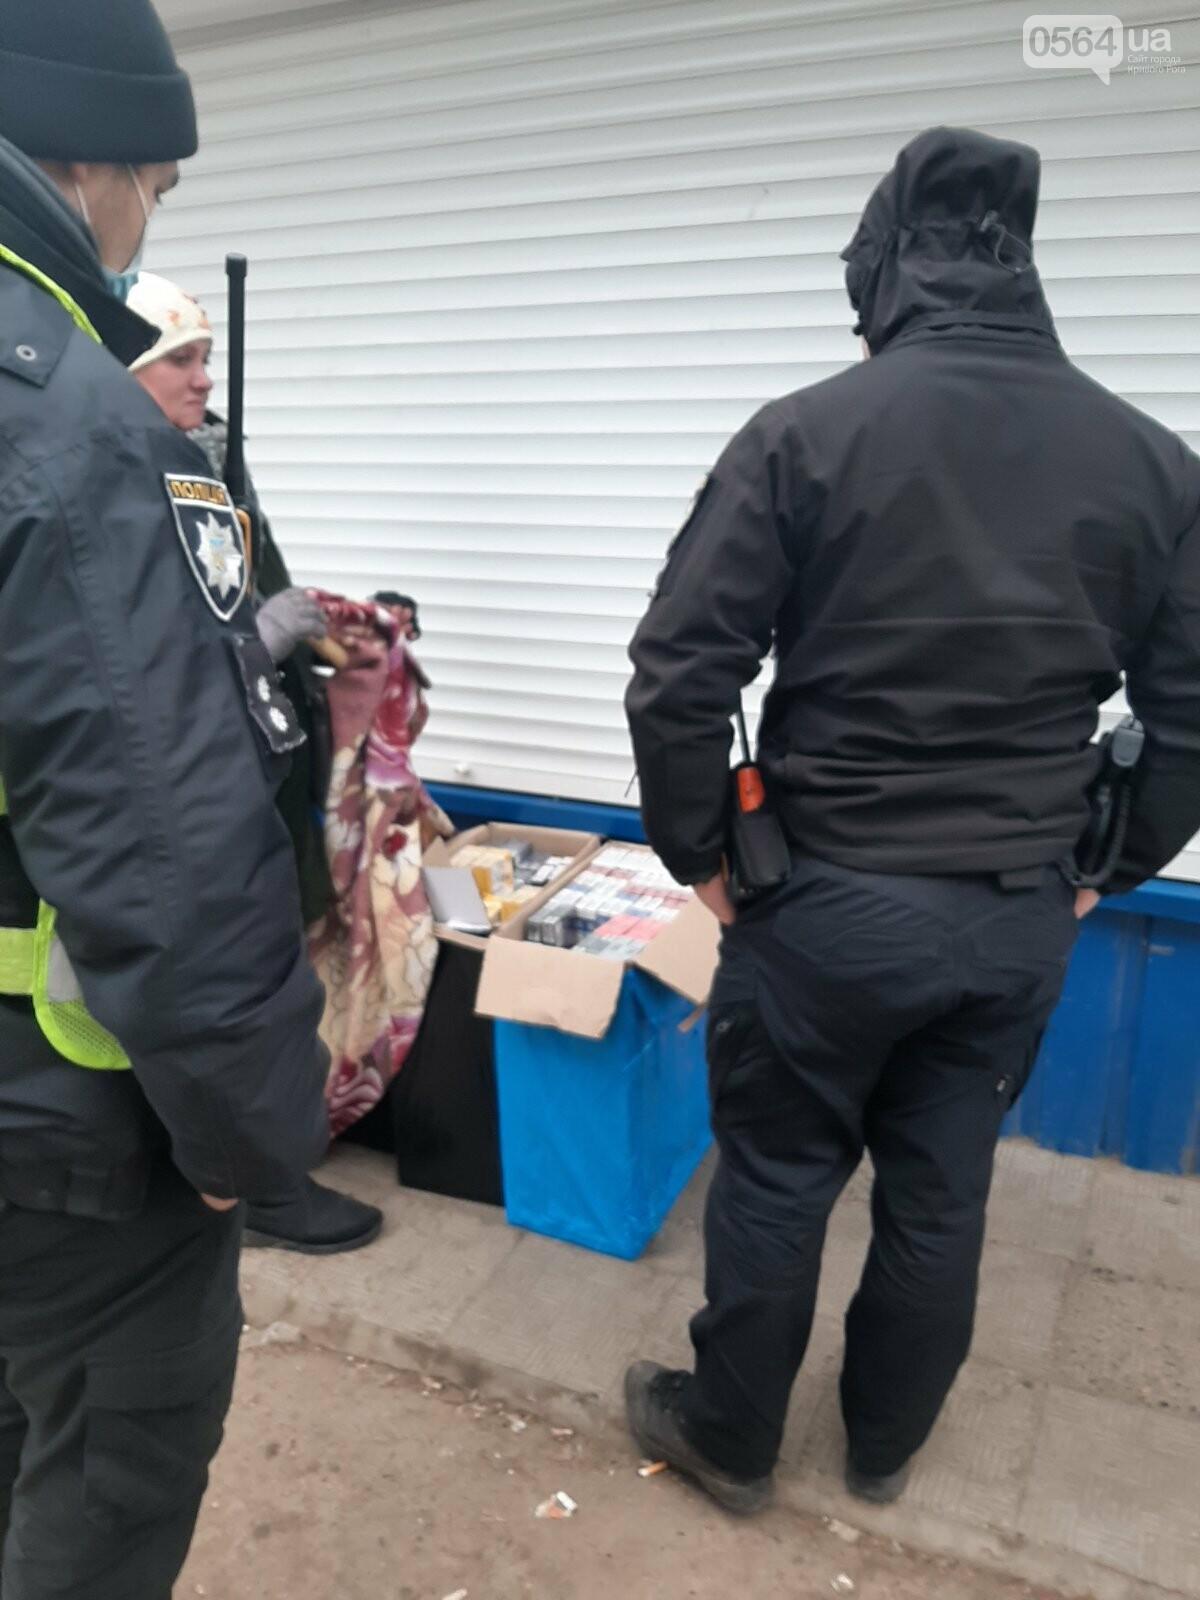 В Кривом Роге изъяли почти 500 пачек сигарет без акцизных марок, - ФОТО , фото-3